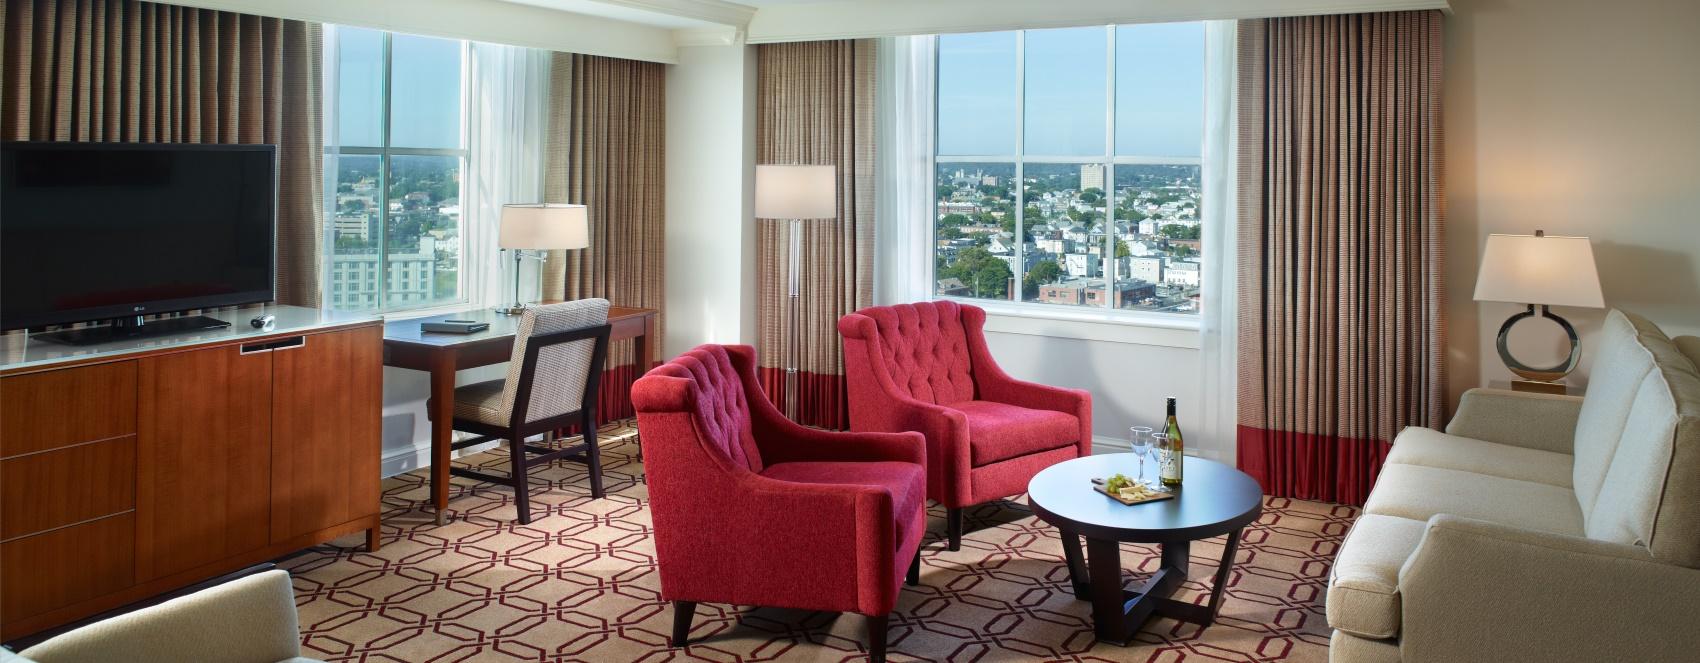 Providence Hotels Omni Providence Hotel